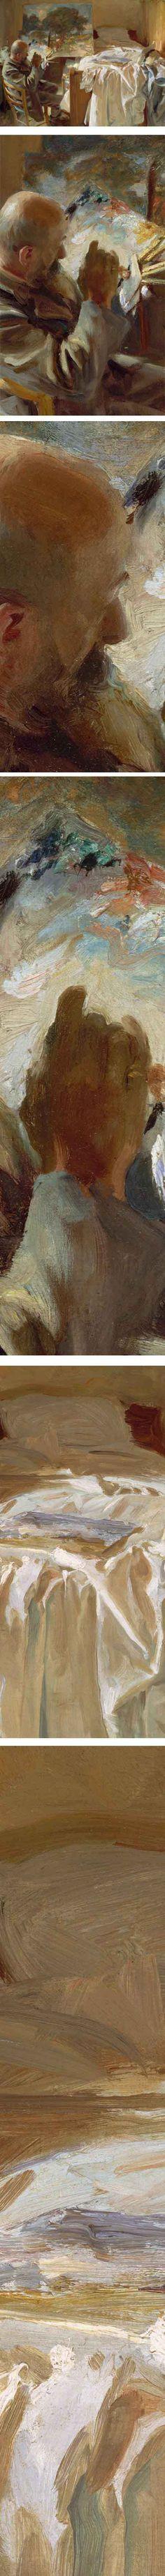 9 Oil Painting Techniques For Beginners John Singer Sargent, An Artist In His Studio, 1904 Zoomed, Oil Painting Tips, Oil Painting For Beginners, Oil Painting Techniques, Painting Lessons, Figure Painting, Beginner Painting, John Singer Sargent, Sargent Art, Portrait Art